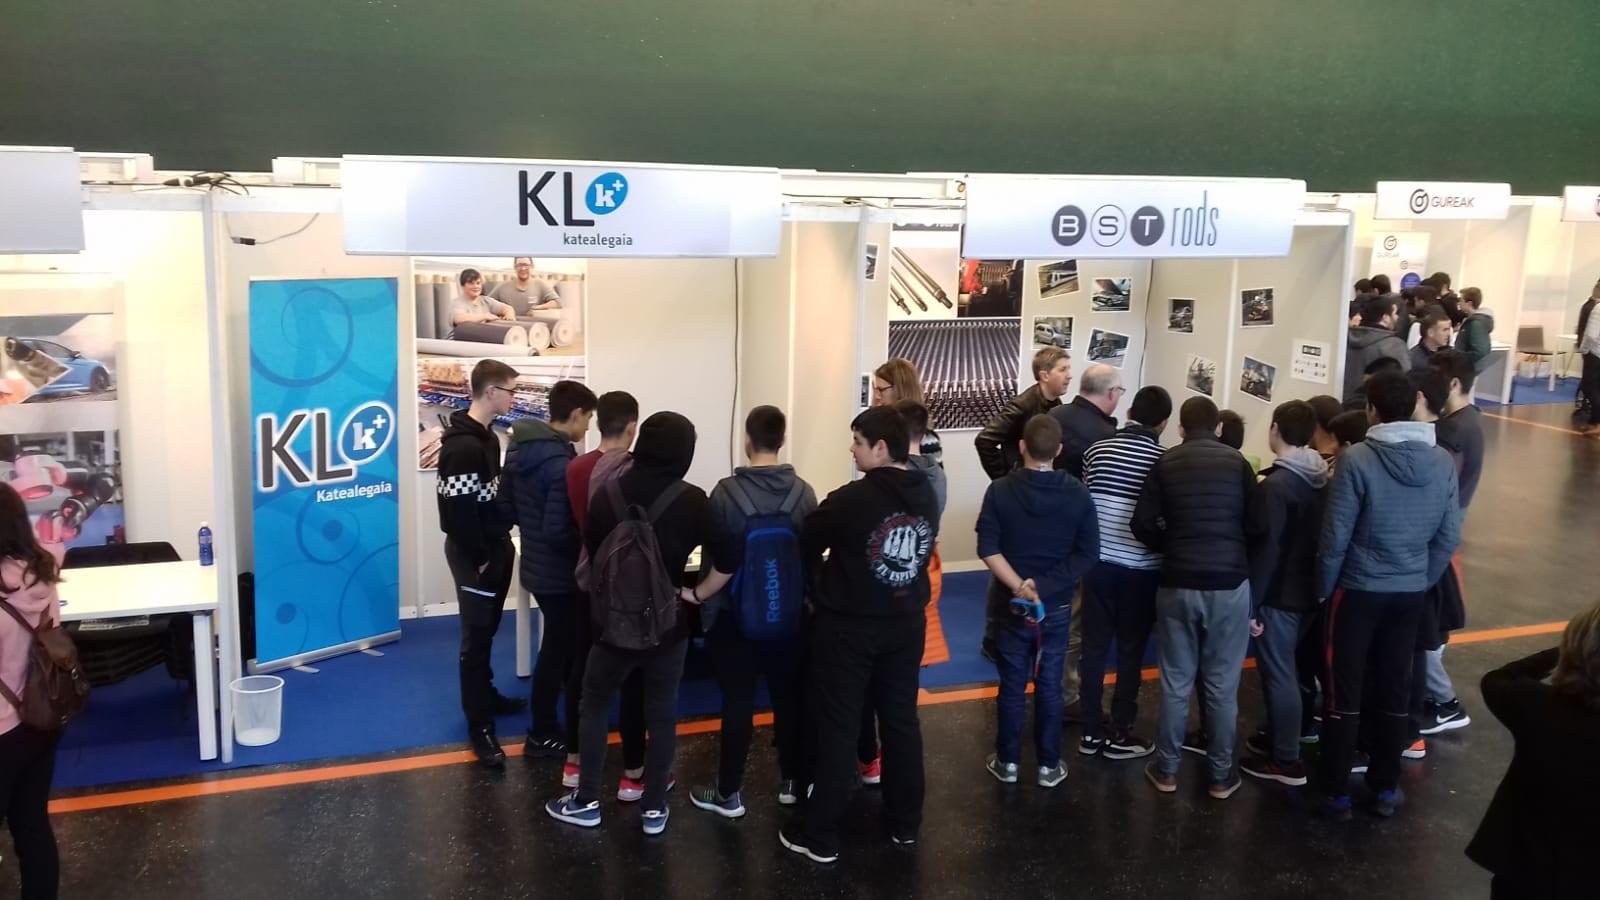 KL katealegaia participa en la I. Feria de Industria y Empleo de Urola Garaia.